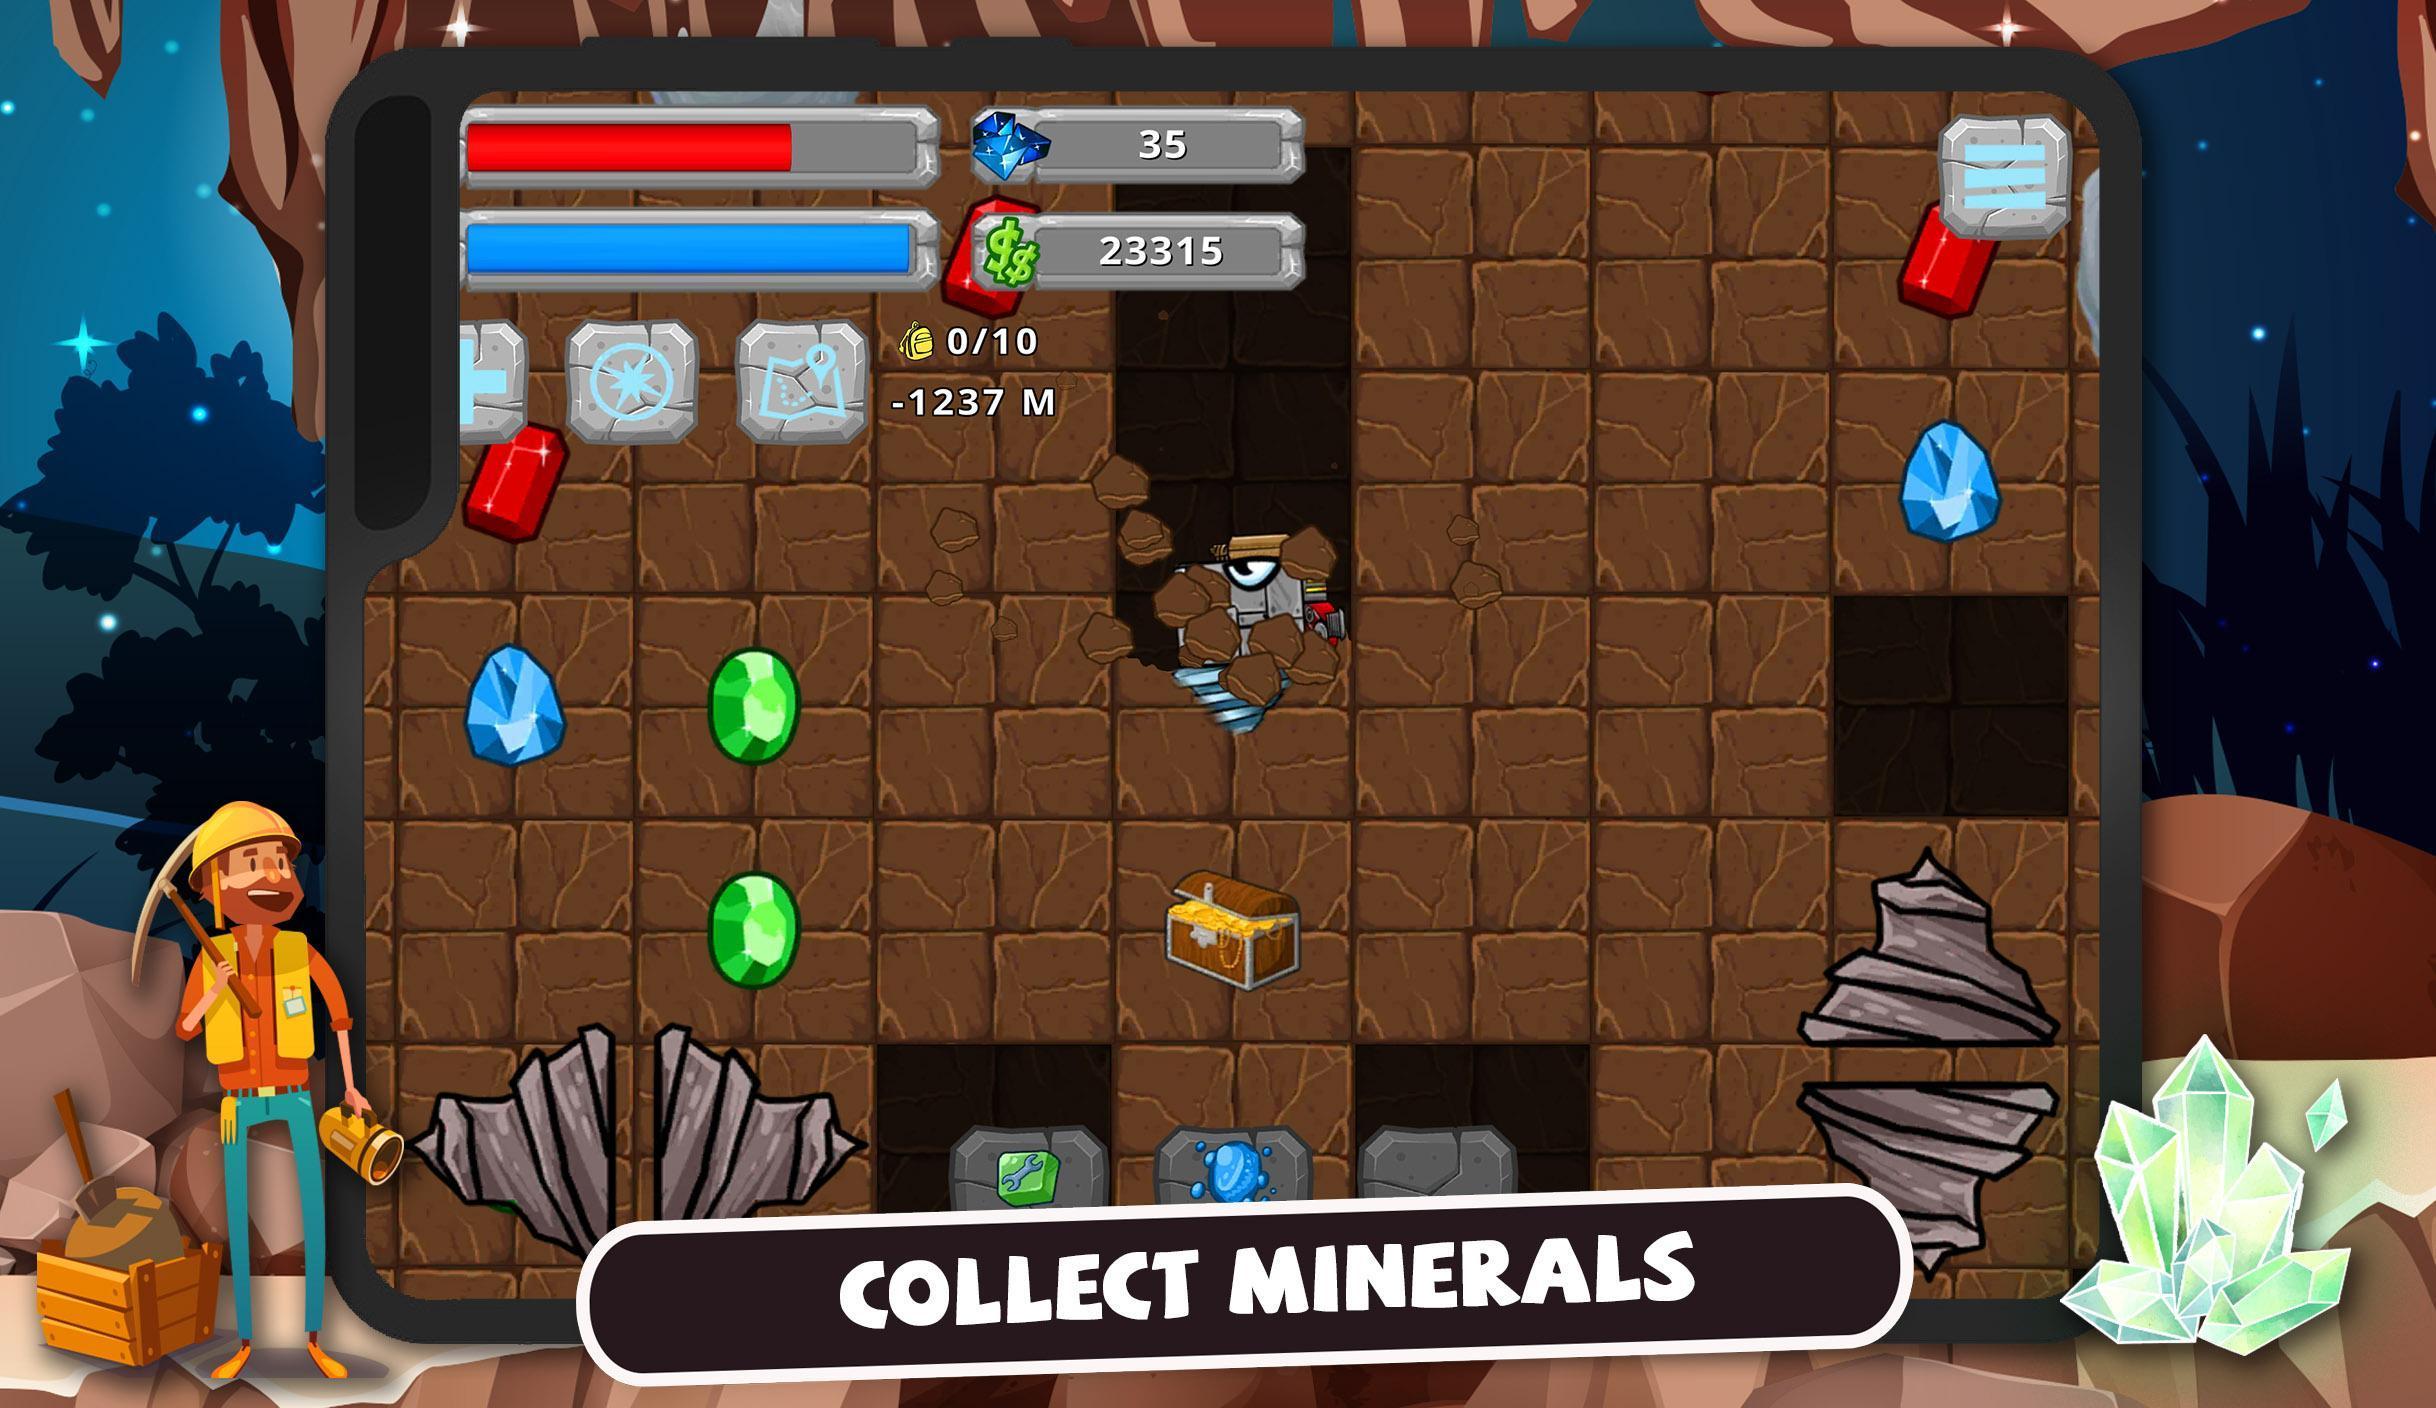 Digger Machine dig and find minerals 2.7.0 Screenshot 15